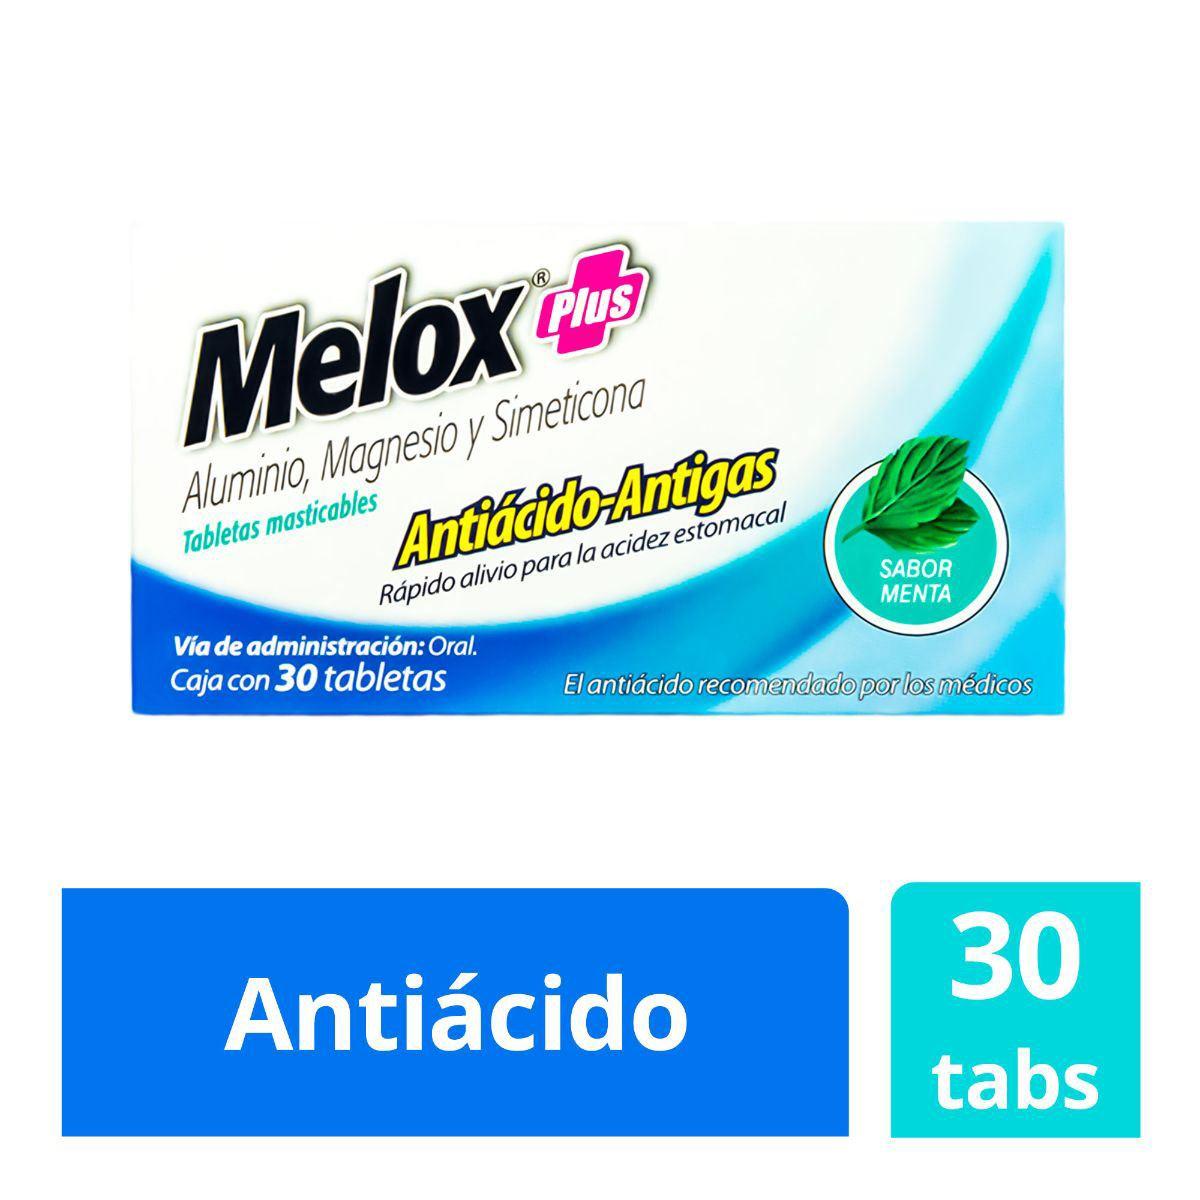 Melox-plus anti gas masticable sabor menta  - Sanborns